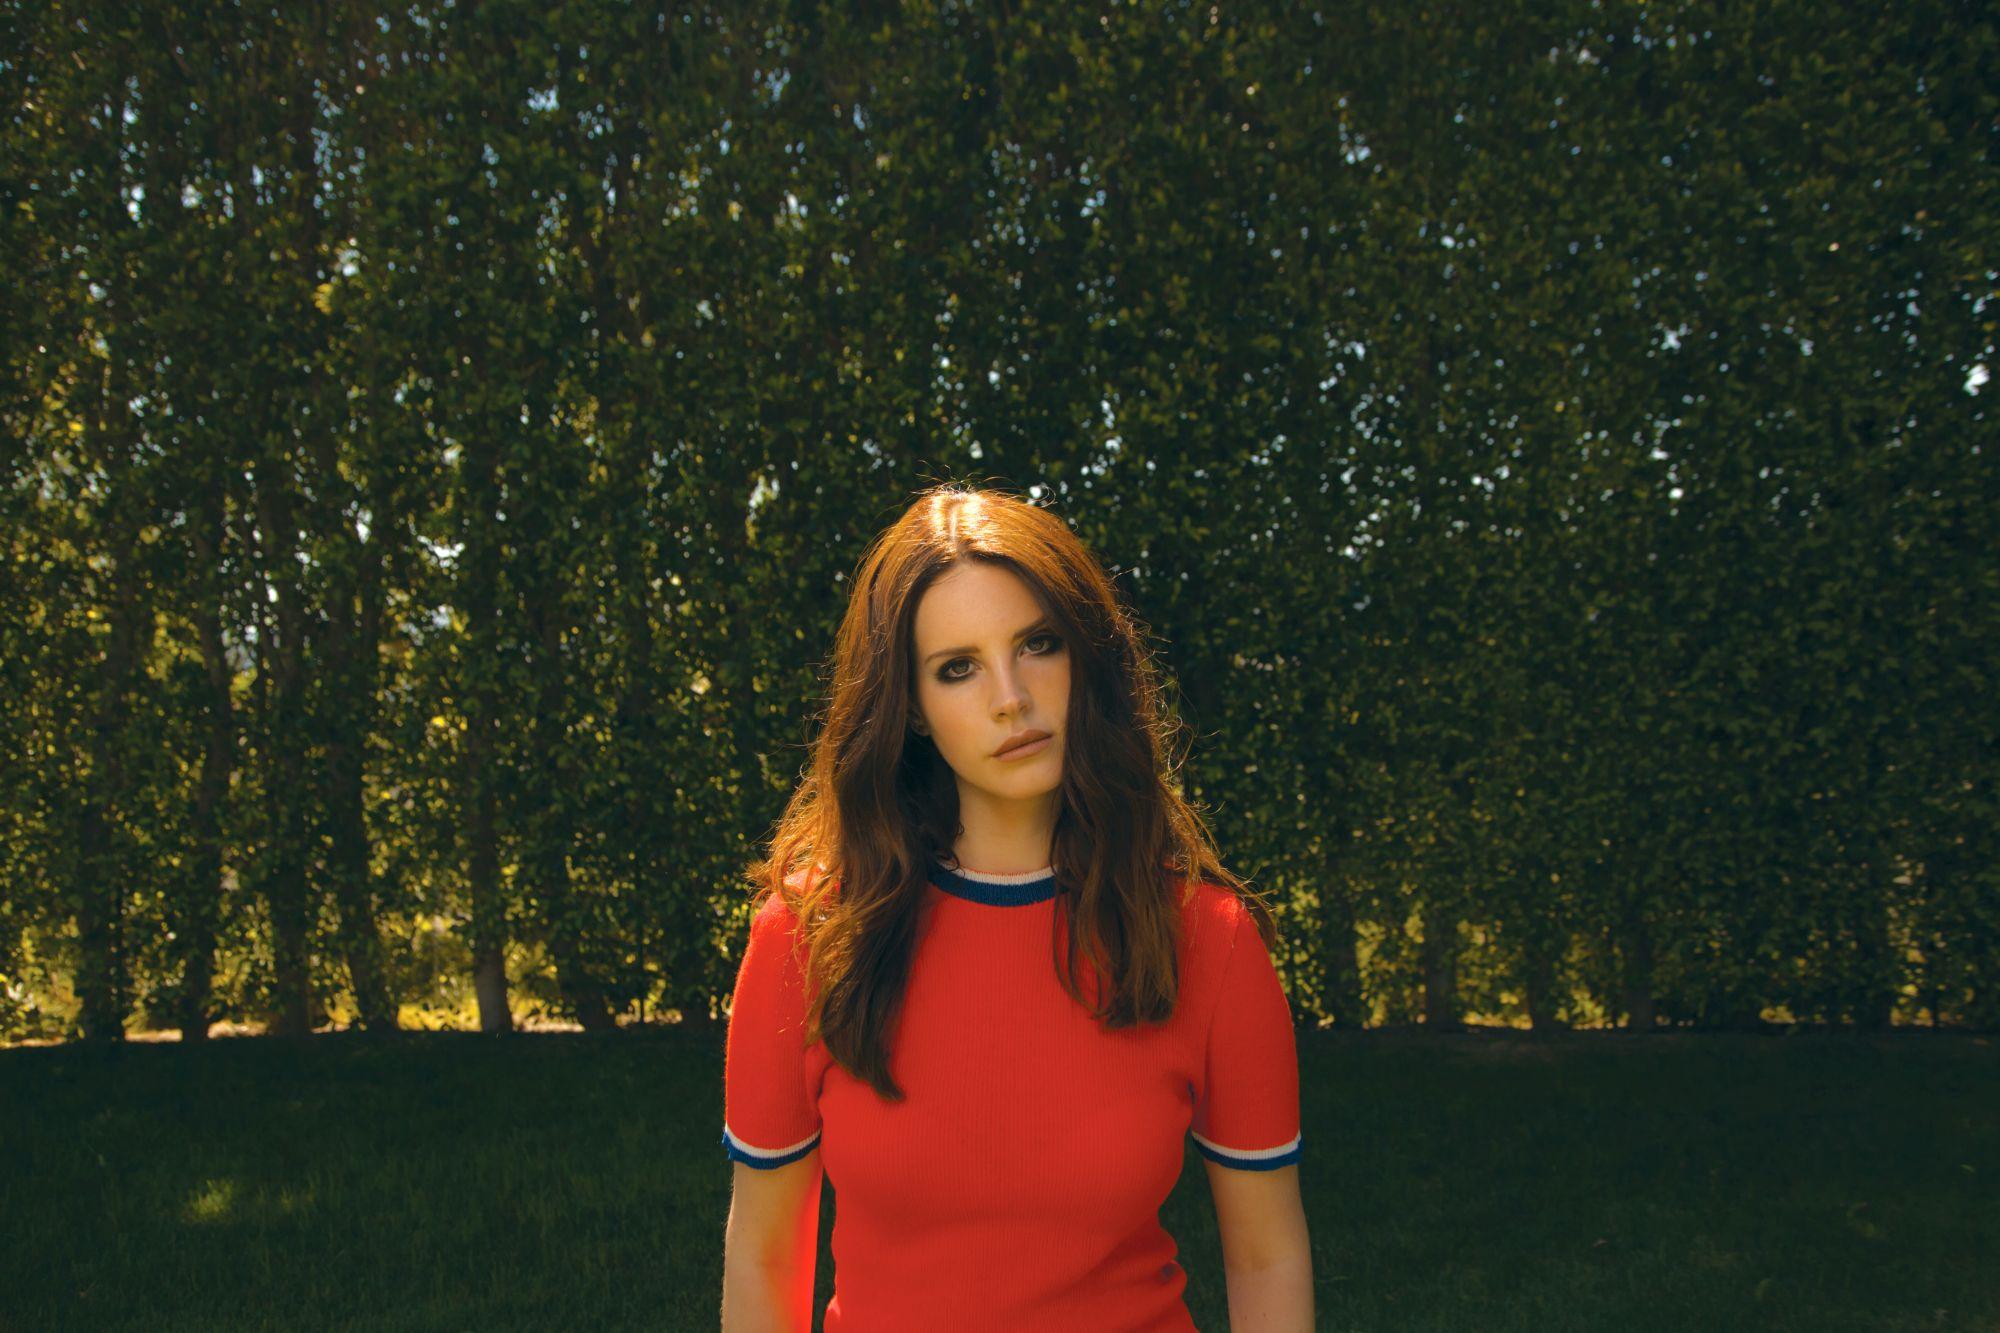 Lana Del Rey Ultraviolence Tumblr 2014: A Year In...